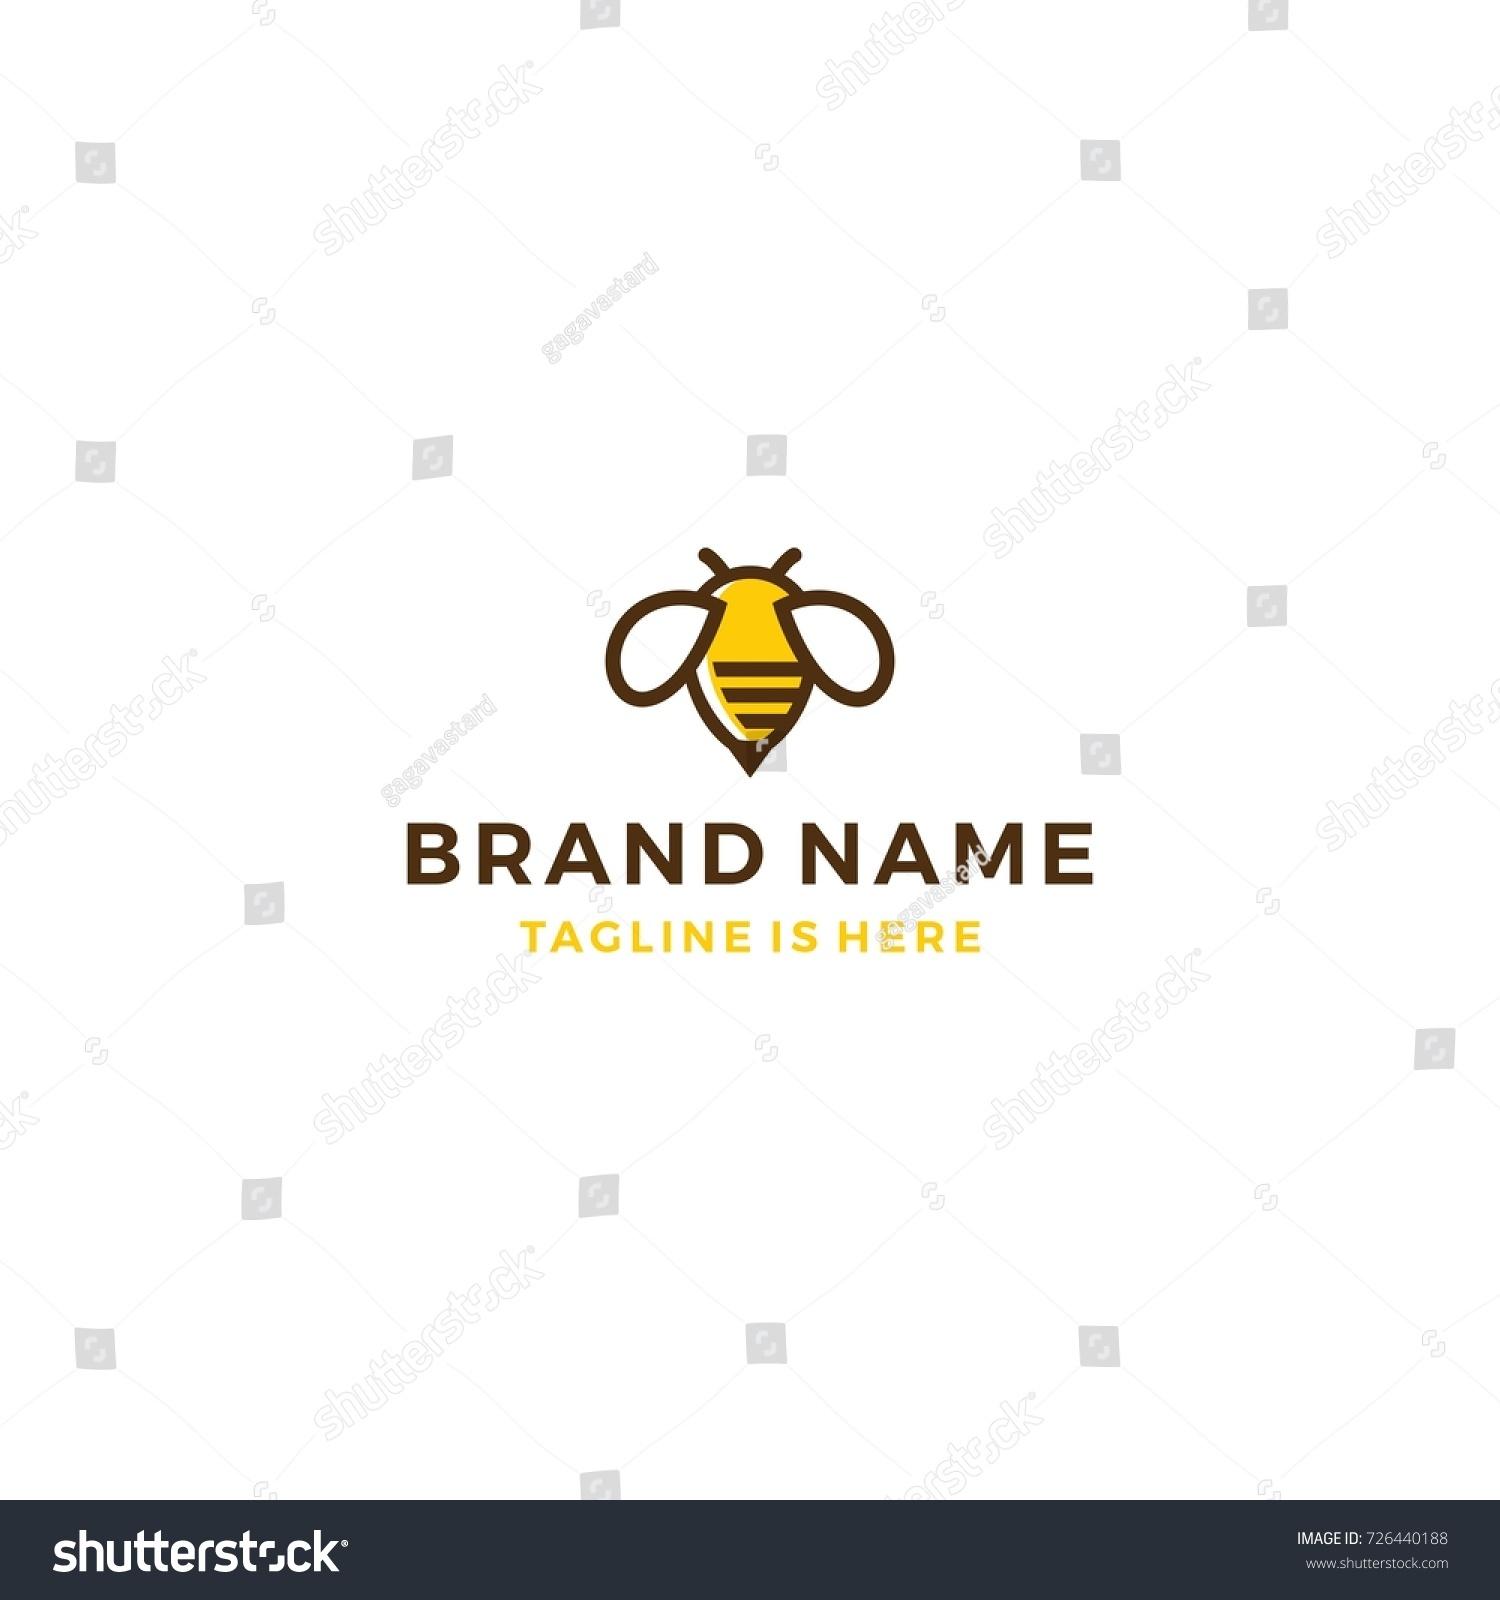 Bumble bee honey hive logo template stock vector 726440188 bumble bee honey hive logo template vector illustration biocorpaavc